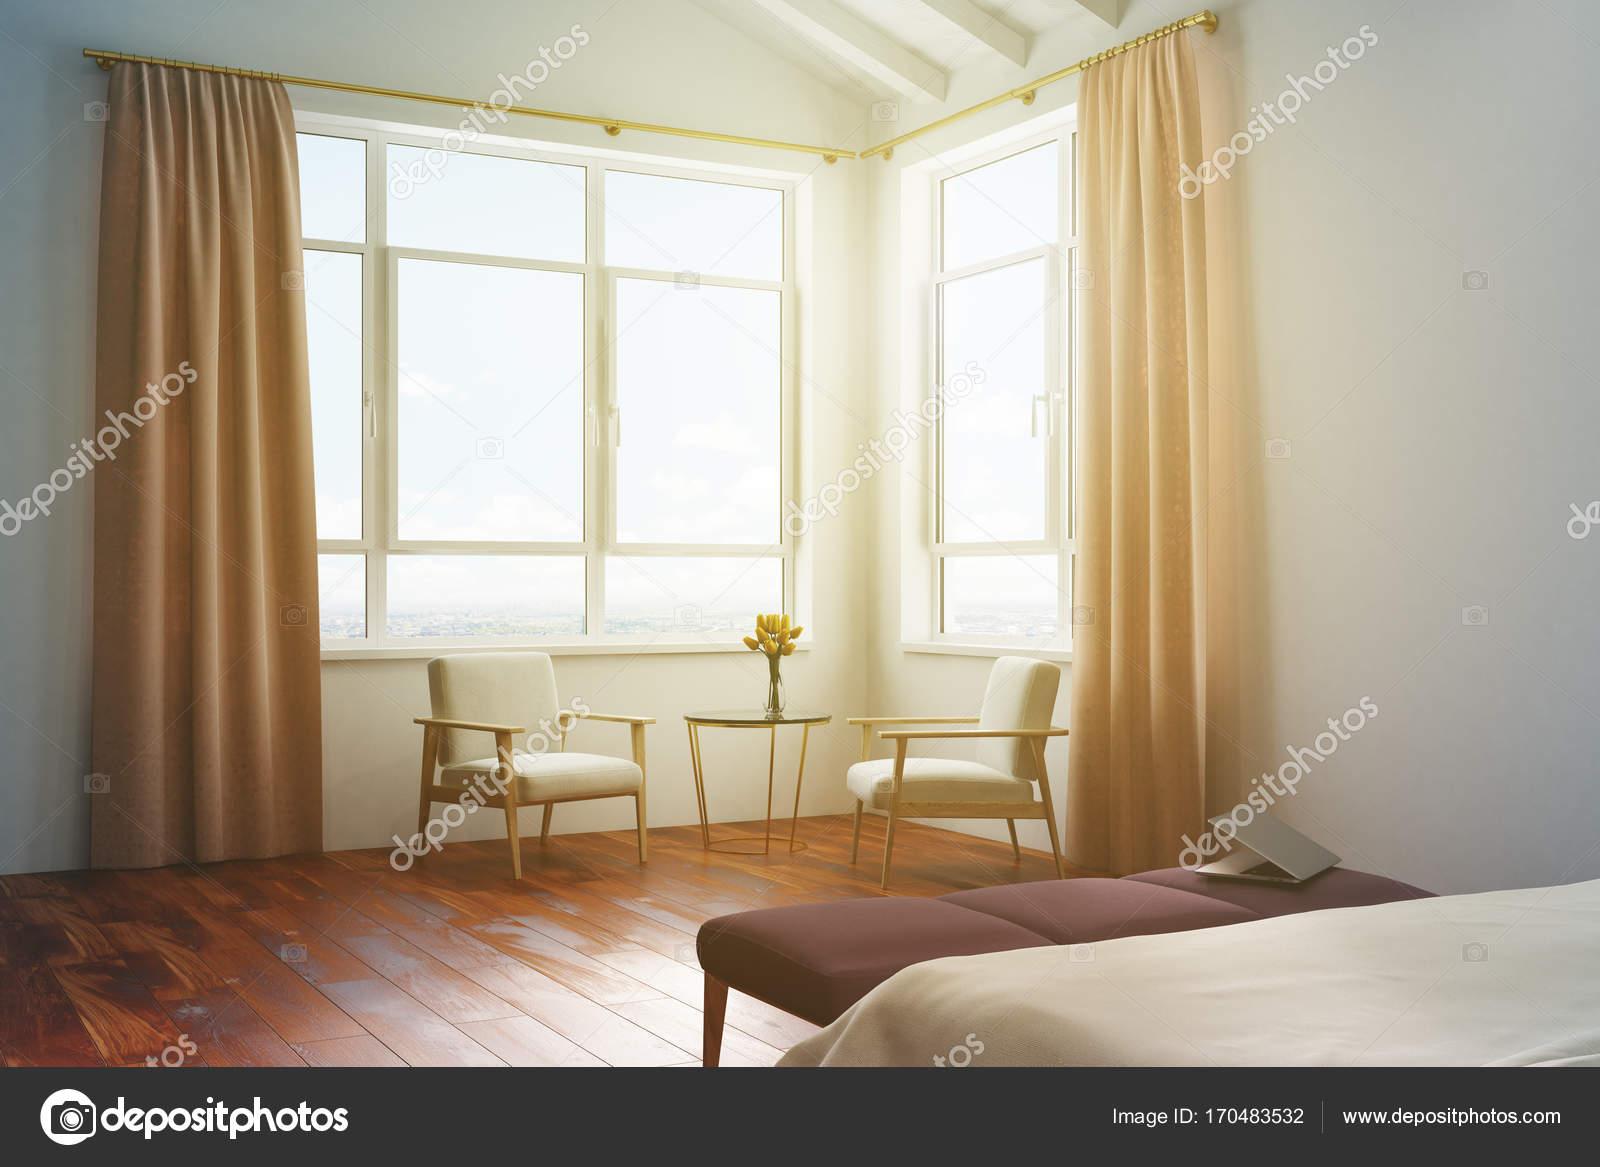 Gordijnen In Slaapkamer : Wit slaapkamer perzik gordijnen toned u stockfoto